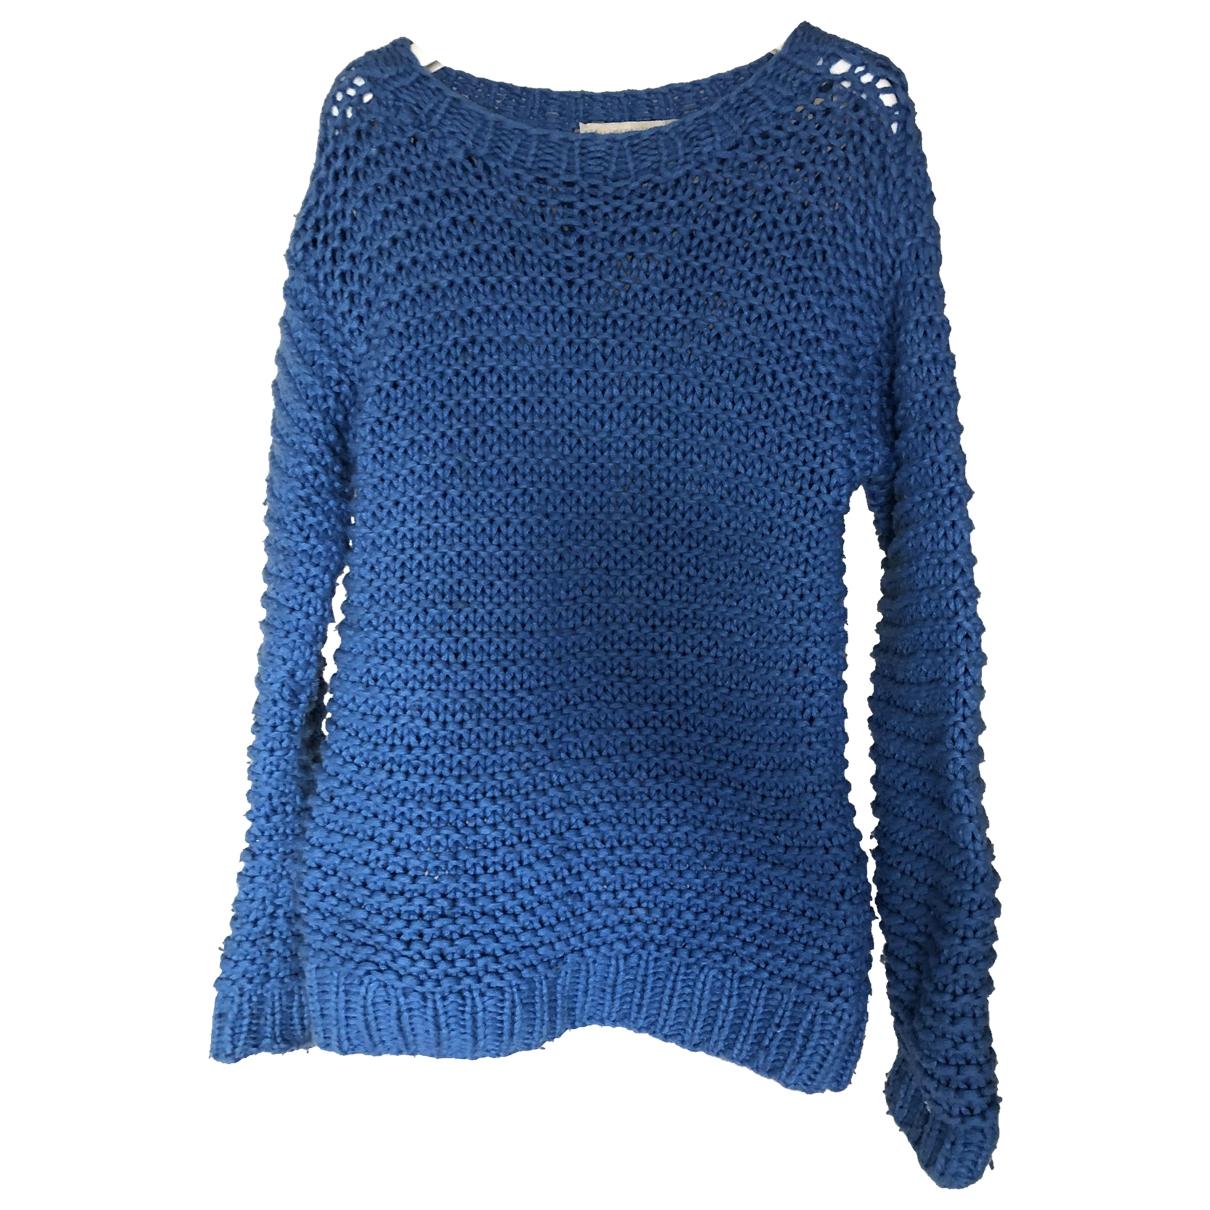 Stella Mccartney Kids \N Blue Cotton Knitwear for Kids 8 years - up to 128cm FR